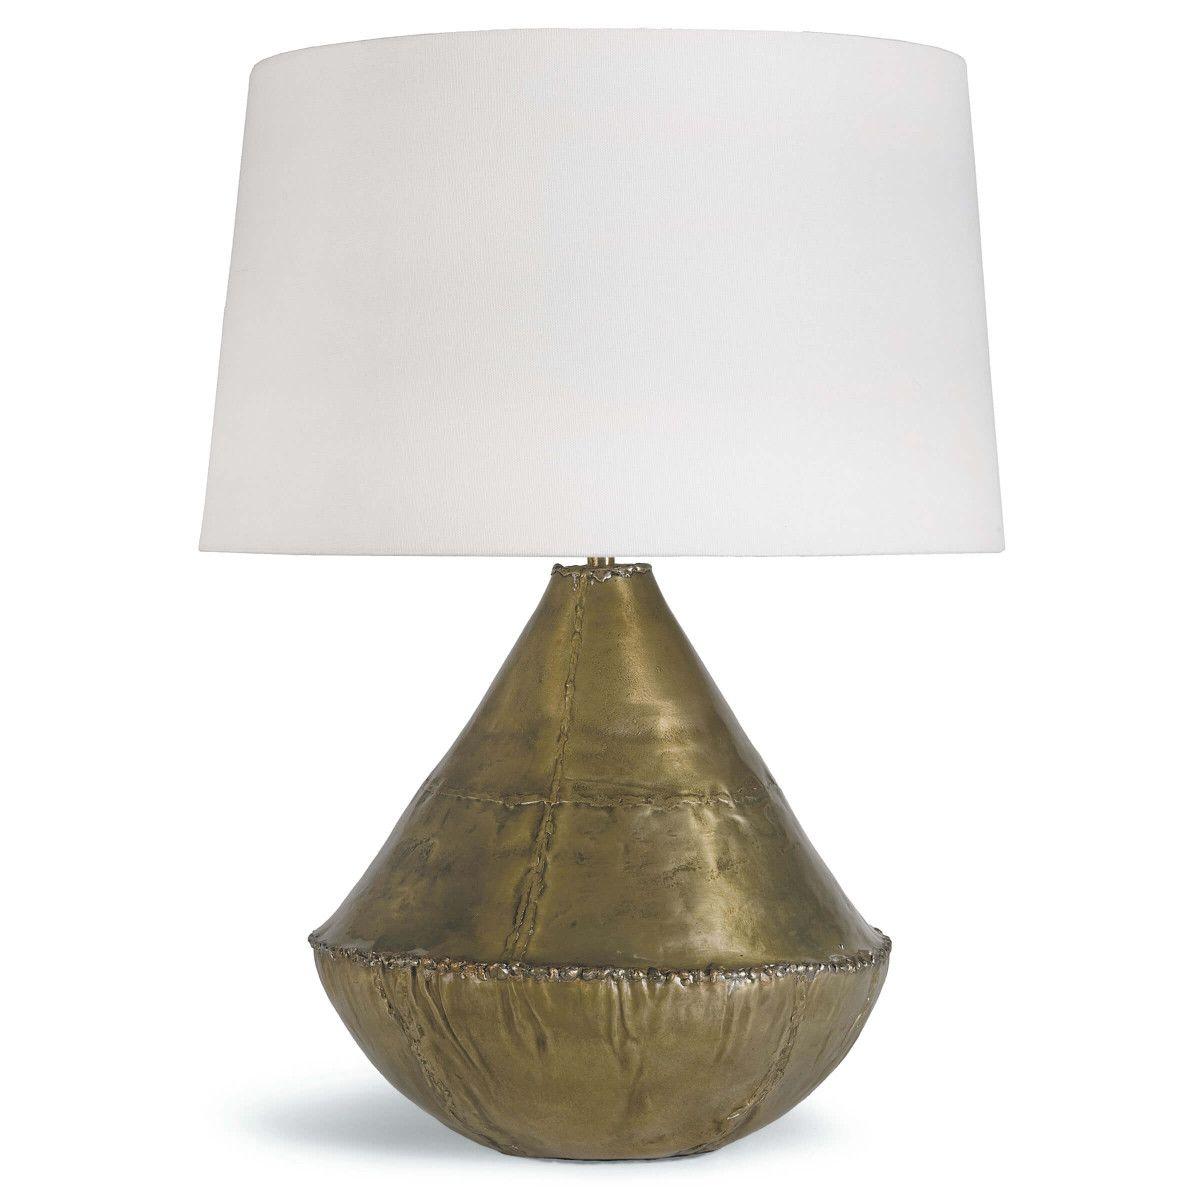 Modern Brass Table Lamp via Redo Home and Design | l i g h t i n g ...